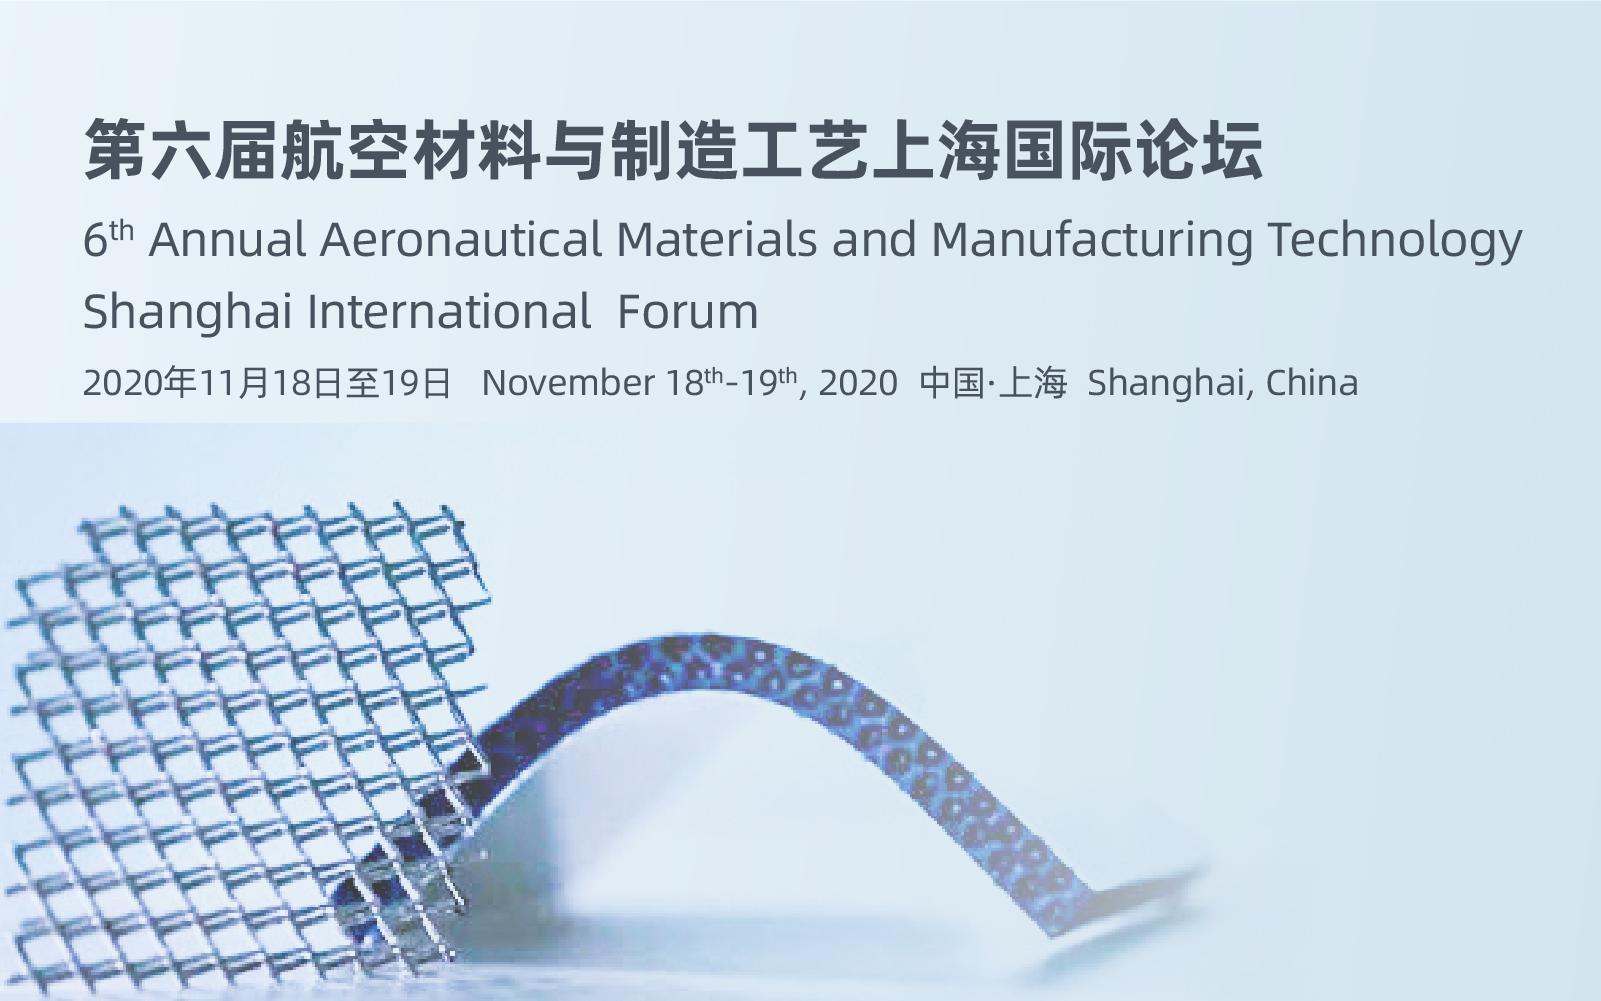 6th Annual Aeronautical Materials and Manufacturing Technology Shanghai International Forum